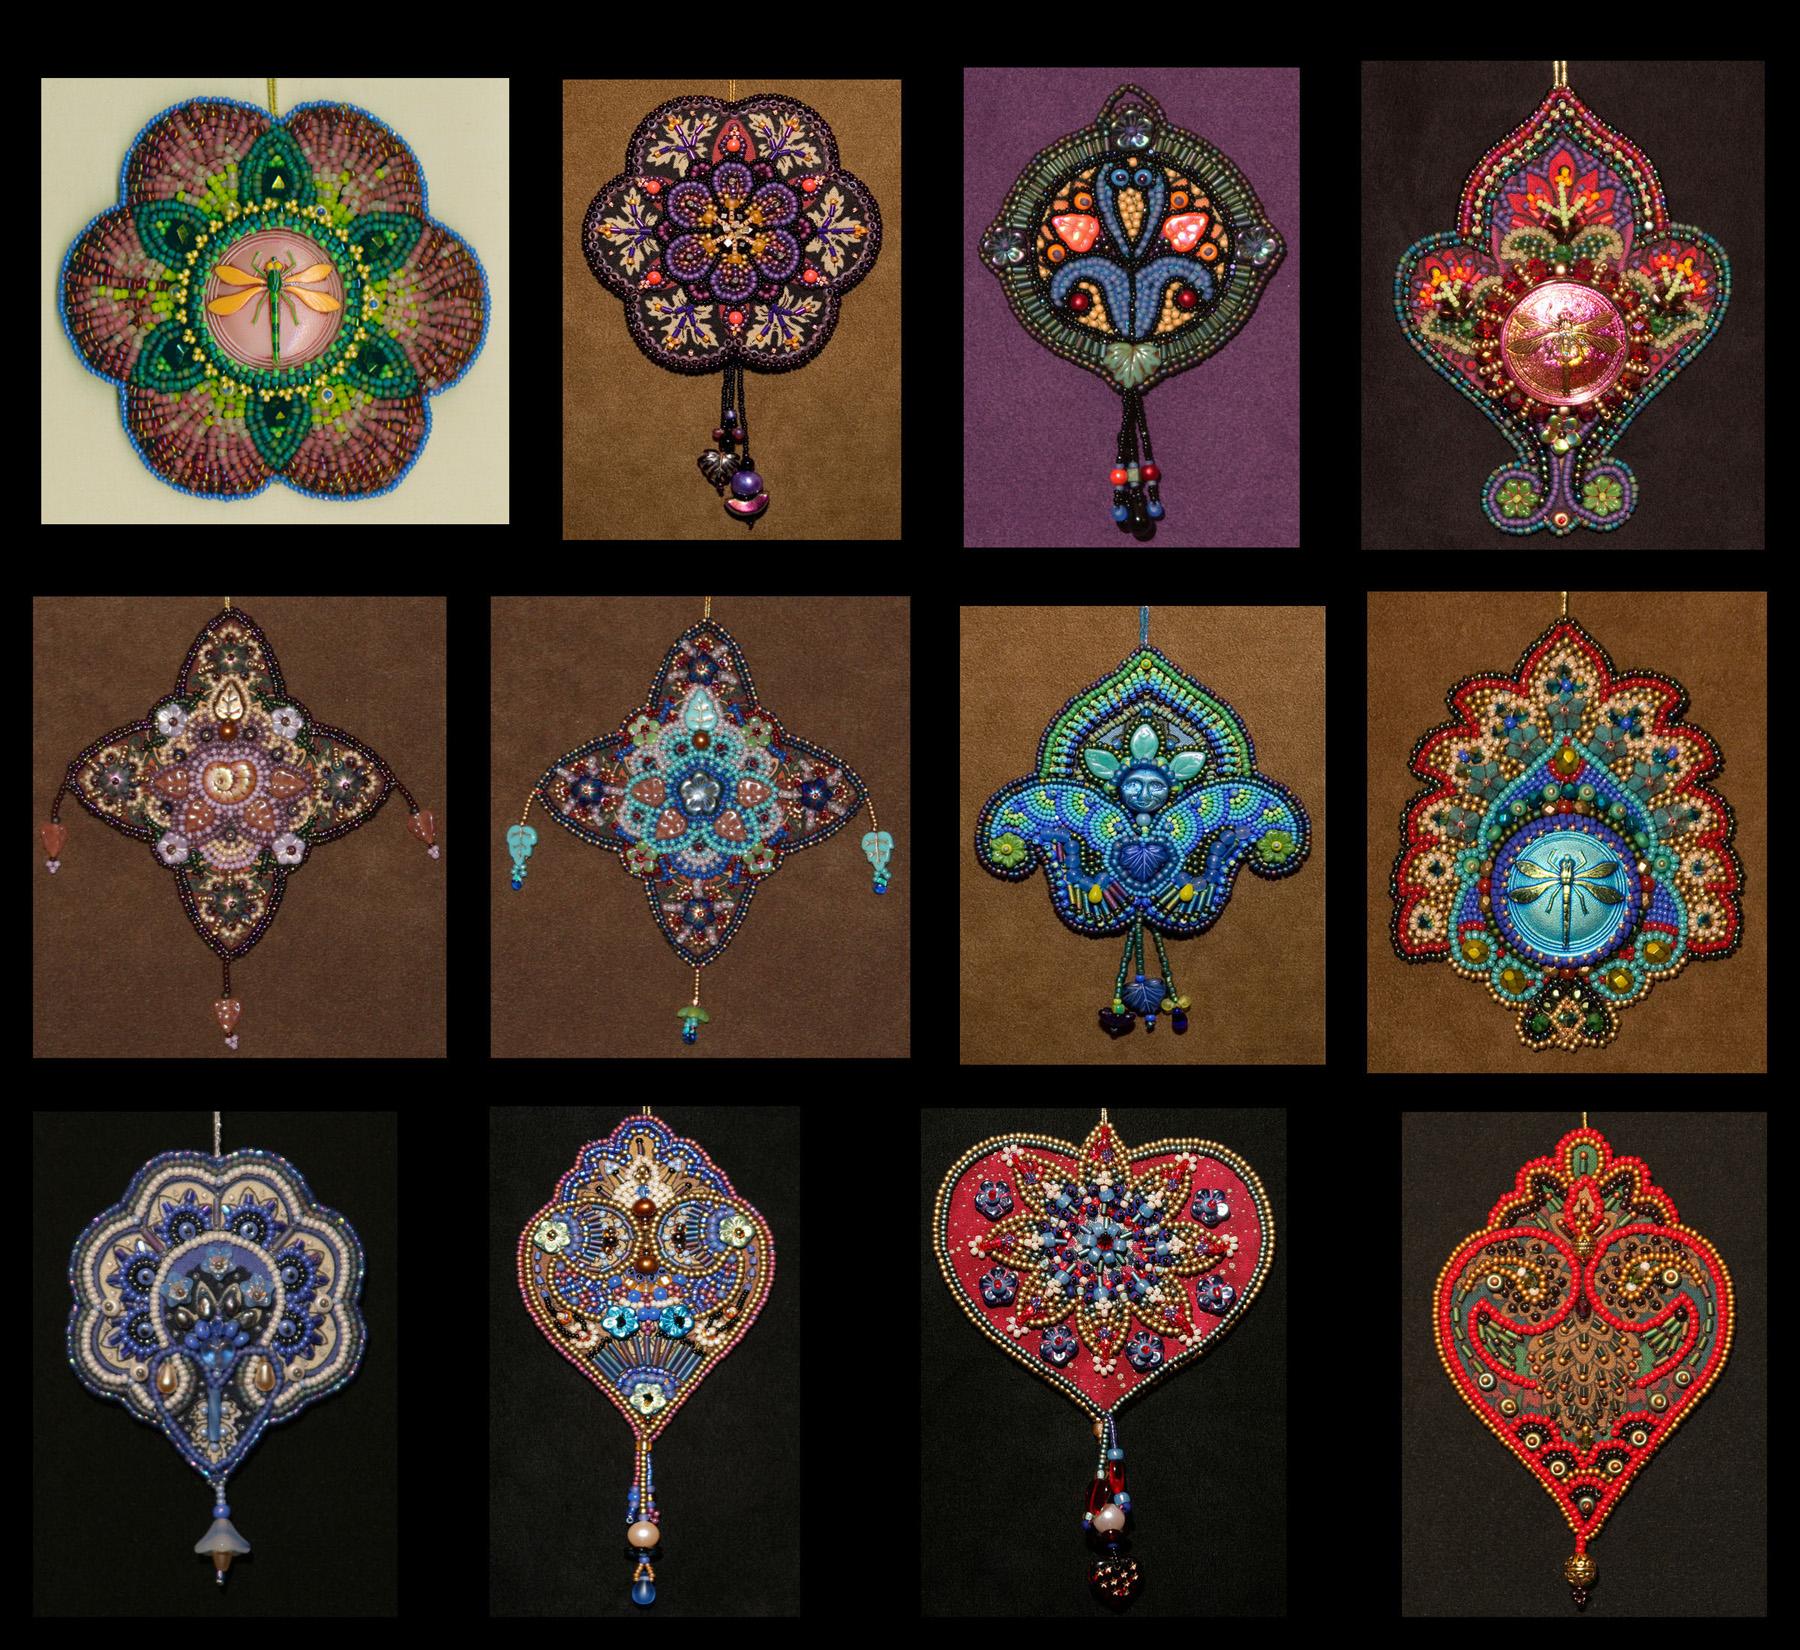 Little Bead Embroidery Projects Five Years Of Designs Lisa Binkley S Fiber Art Blog